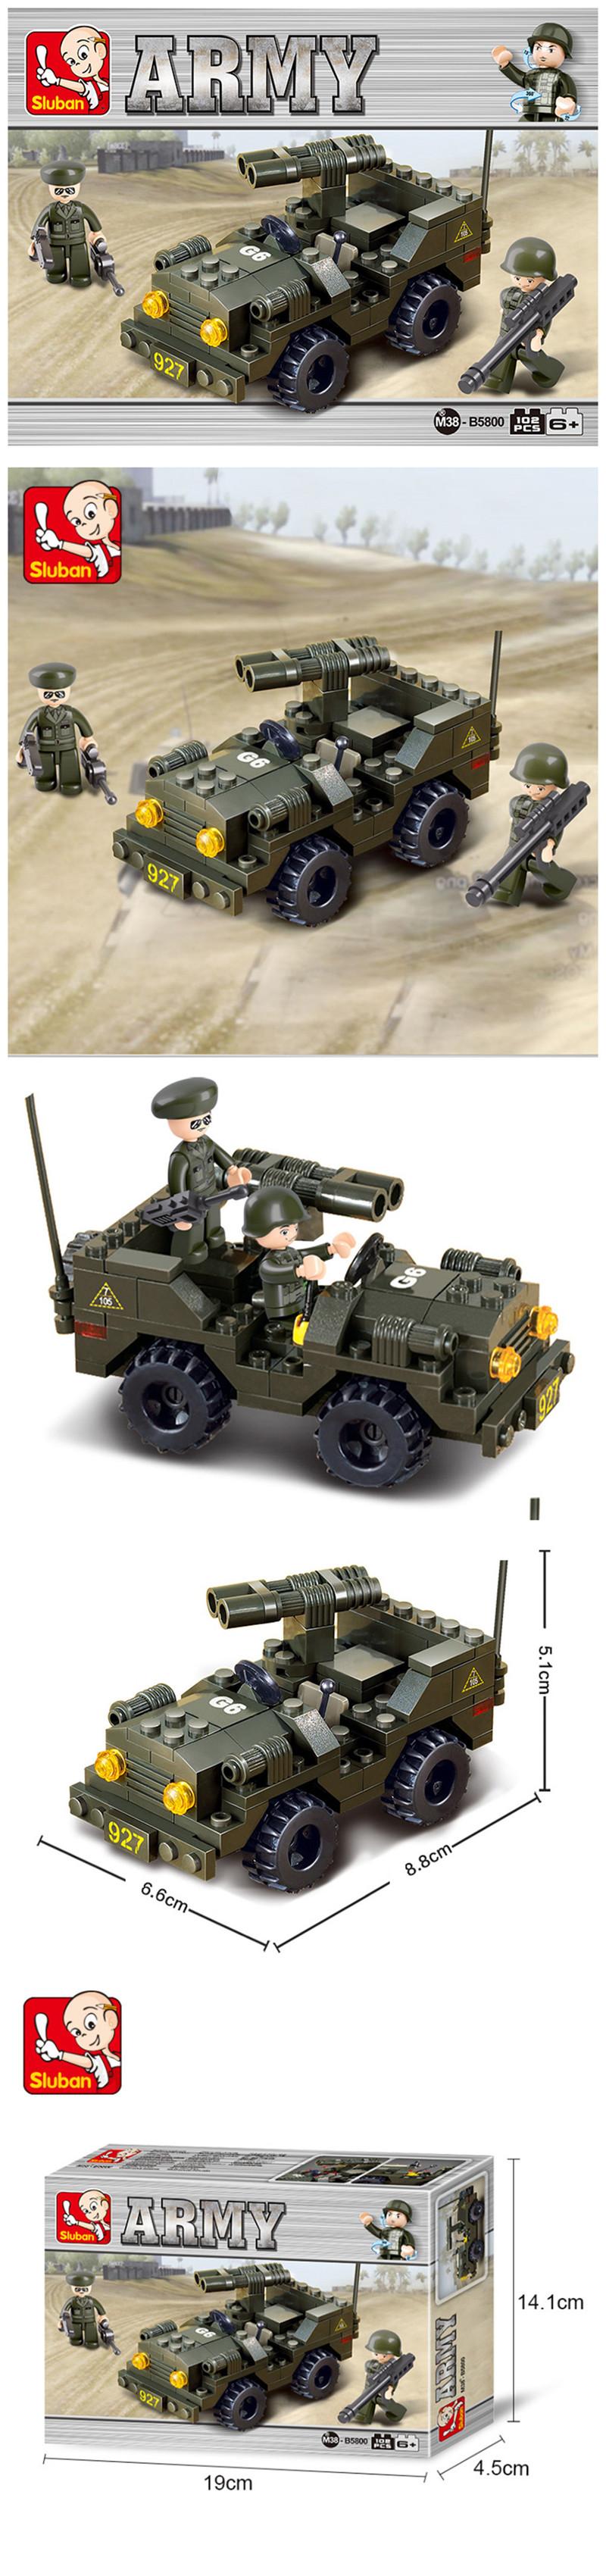 Sluban Building Blocks Kids Toy Vehicle of Army